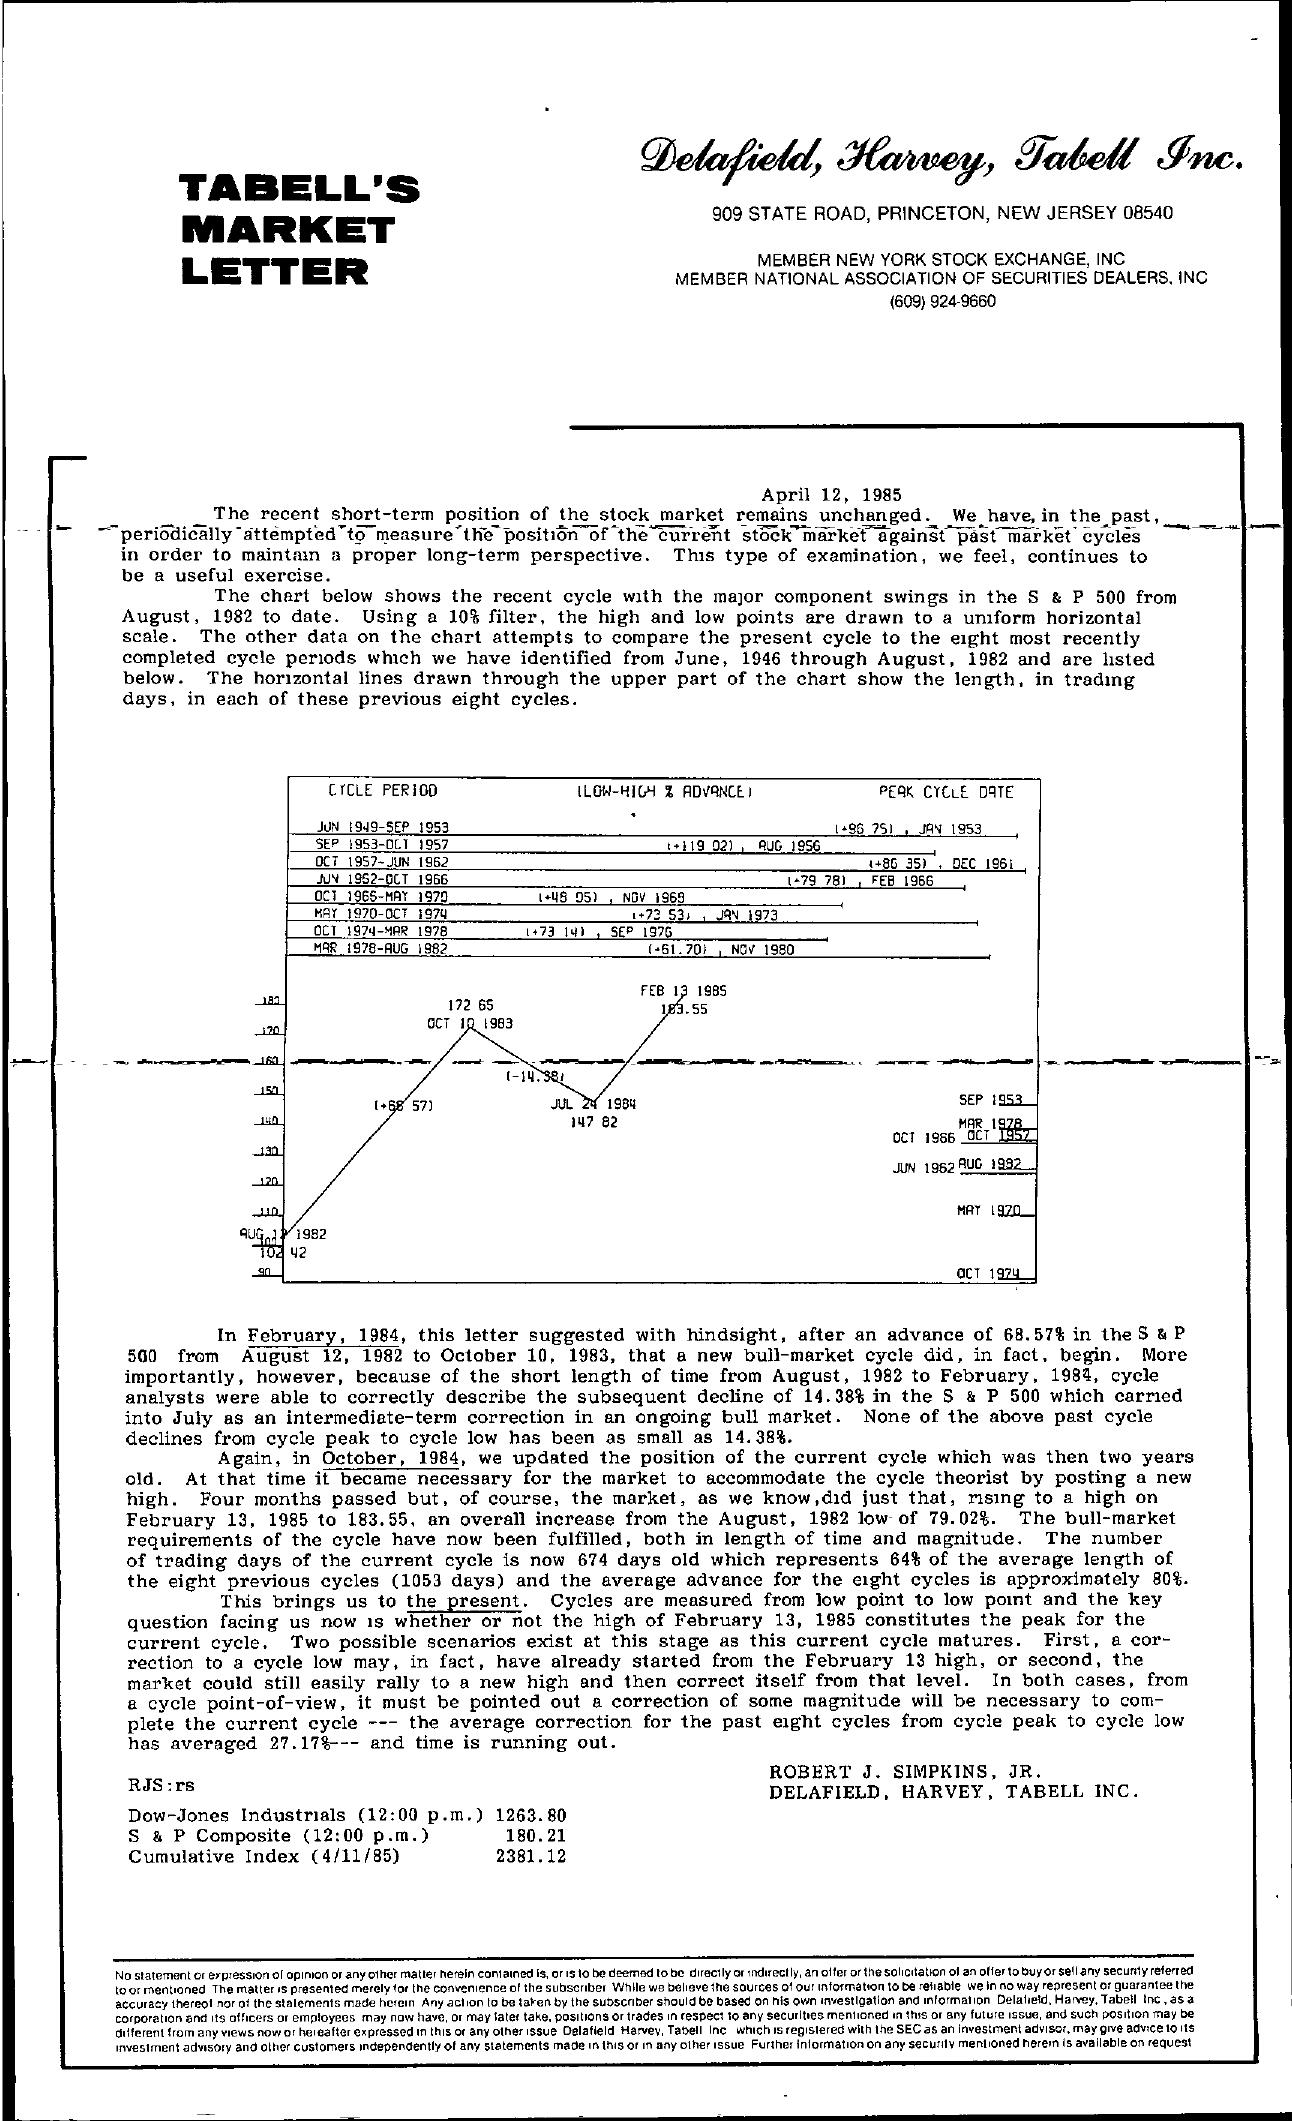 Tabell's Market Letter - April 12, 1985